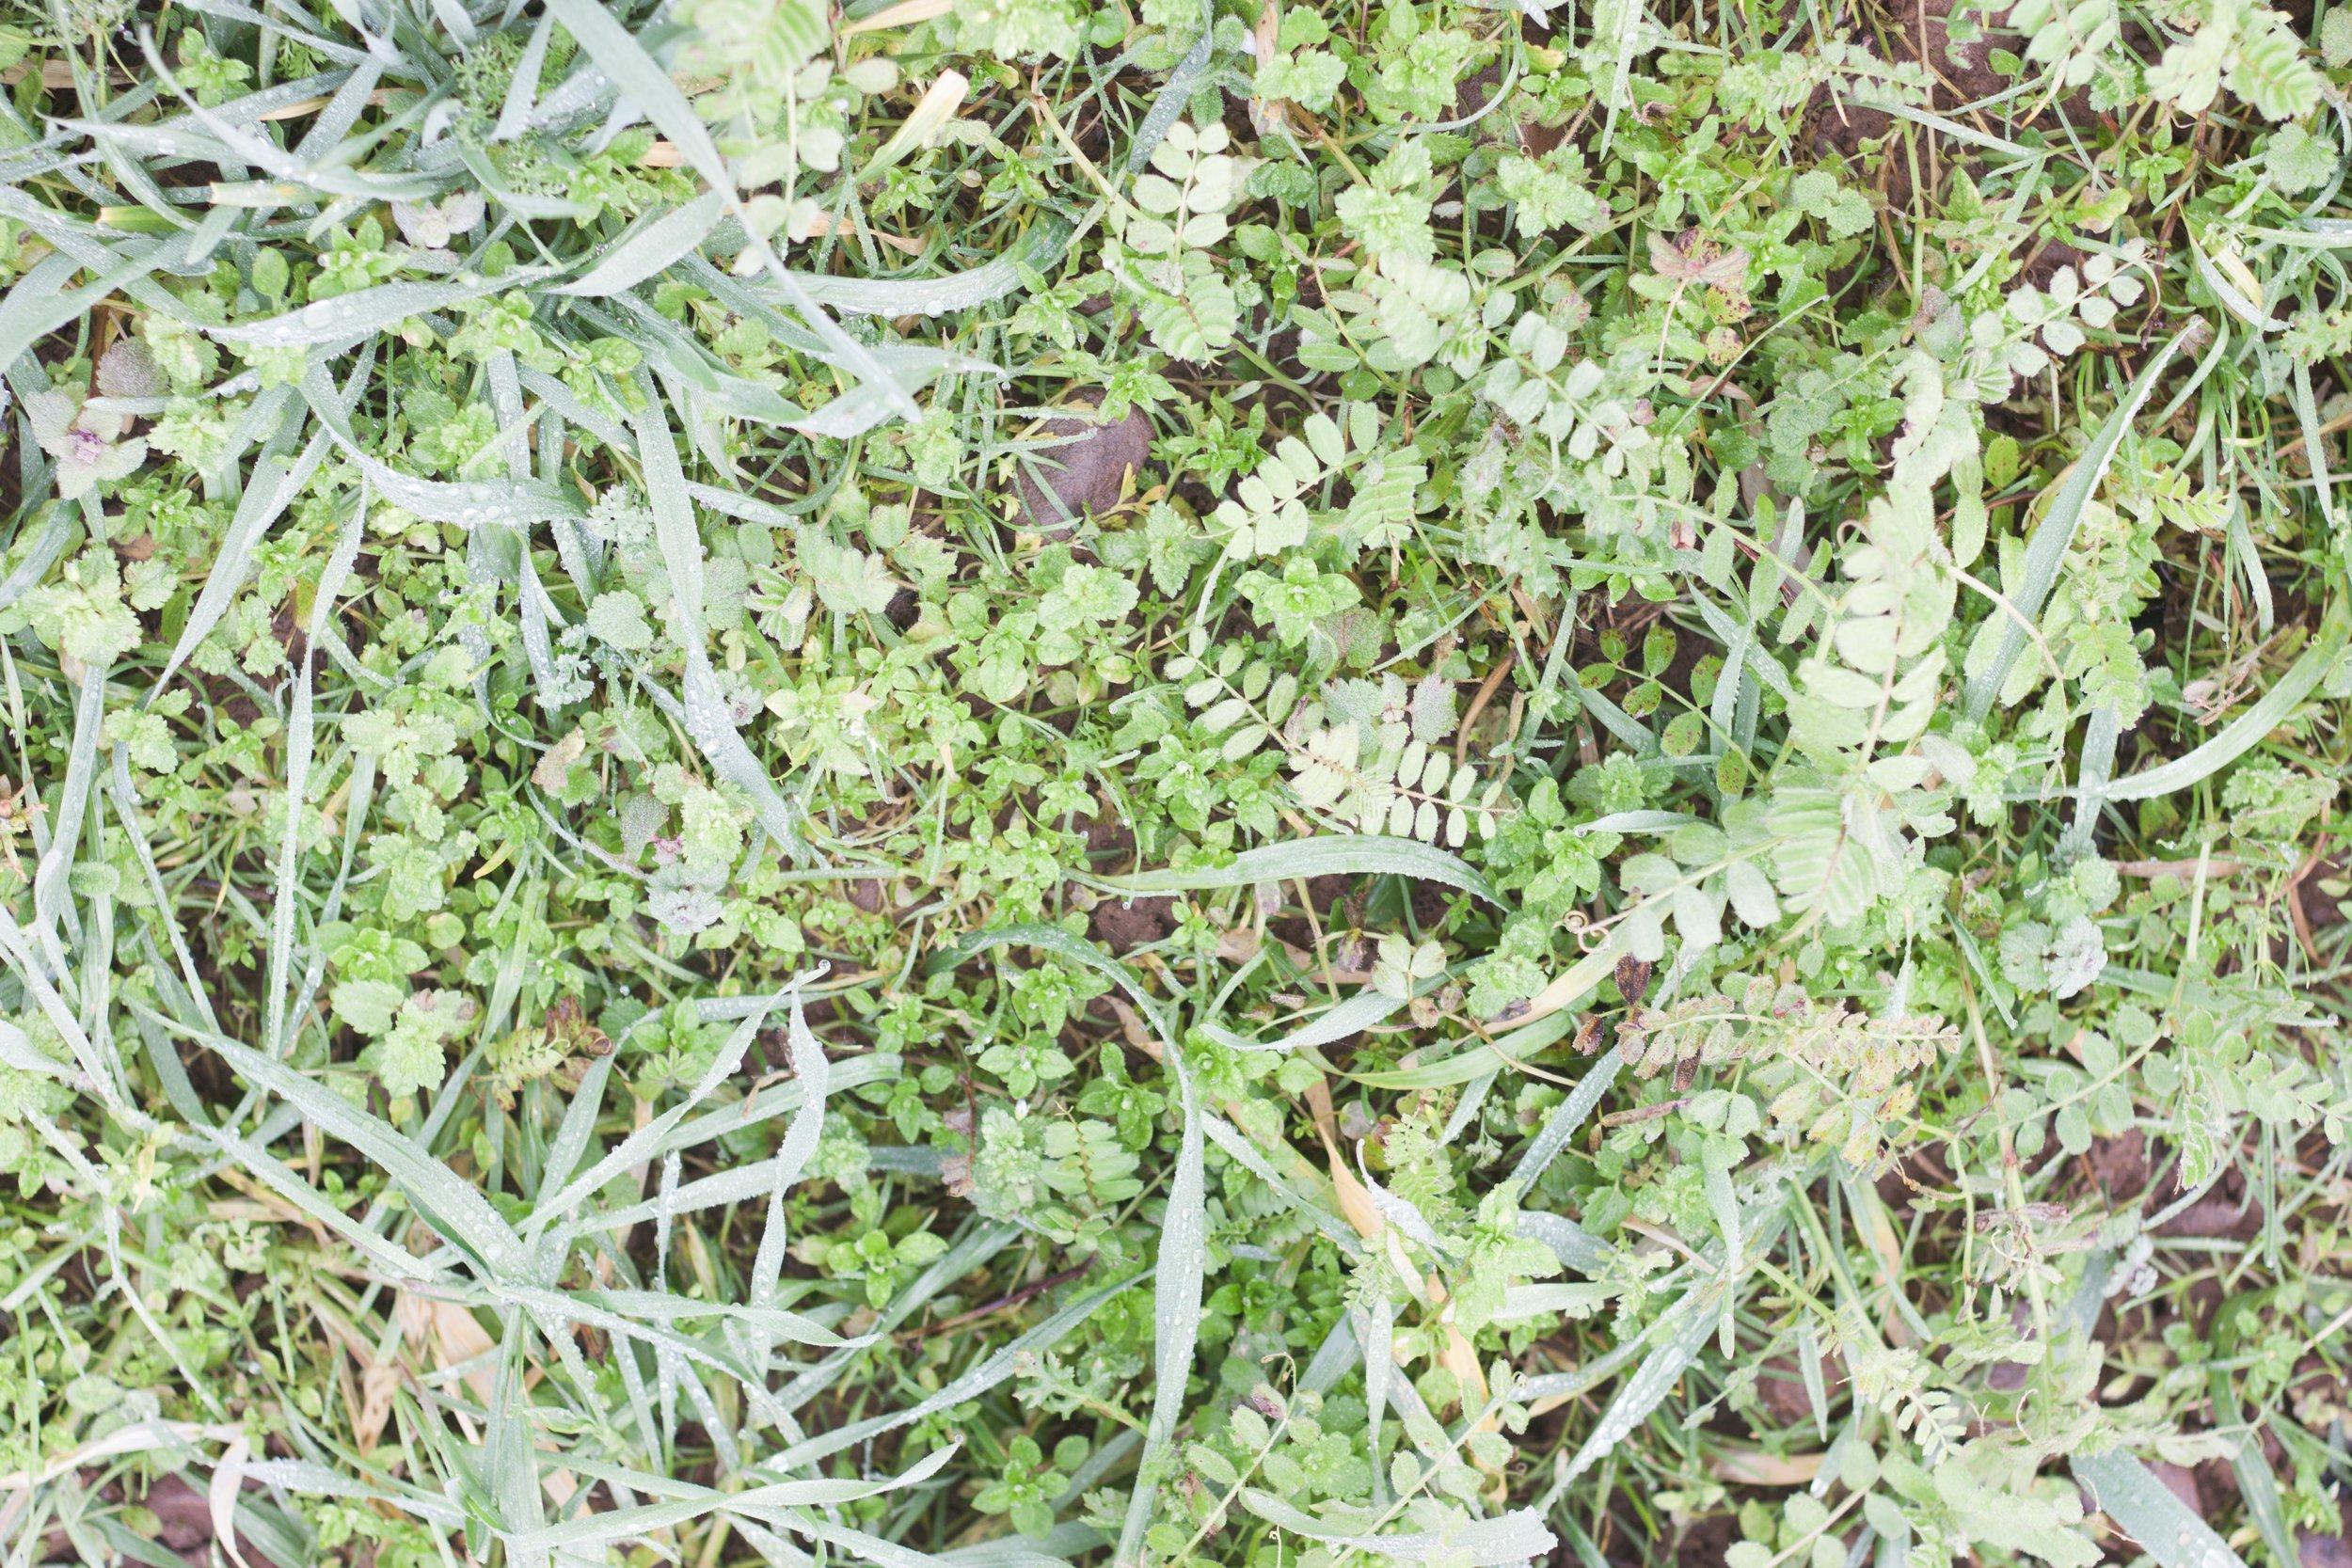 plowright_organic_cover_crop